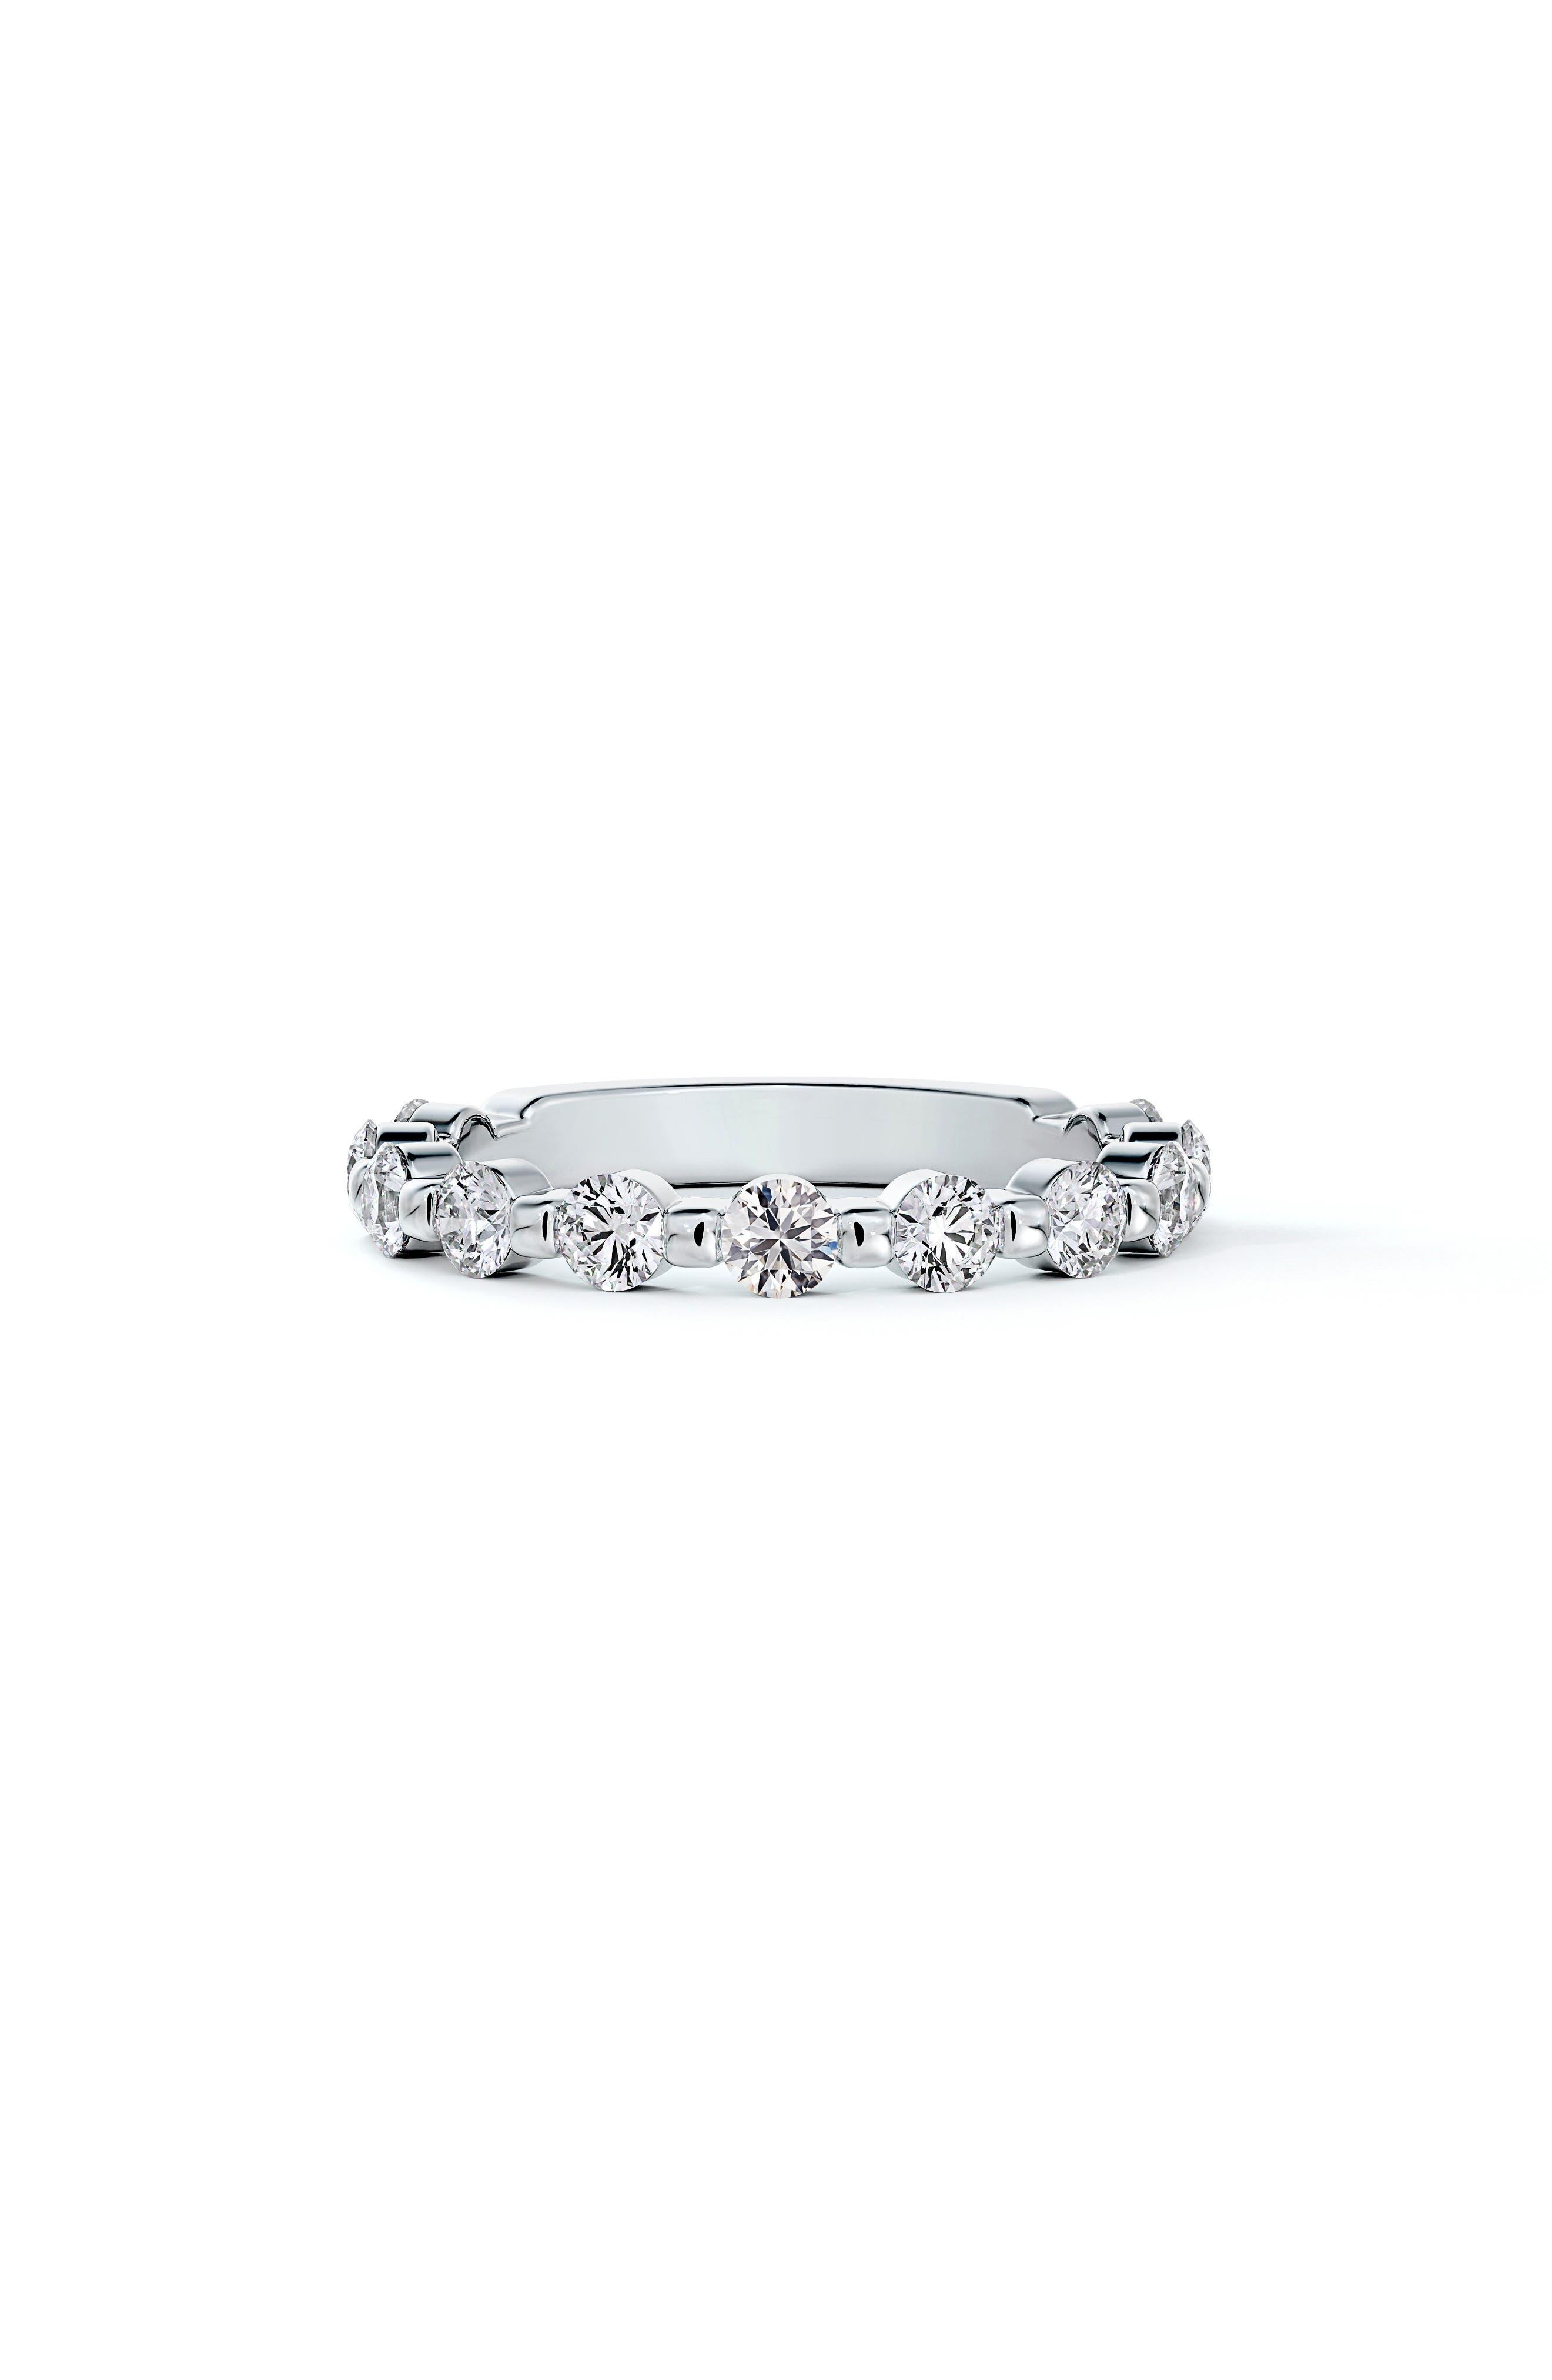 Engagement & Commitment Single Shared Prong Diamond Band